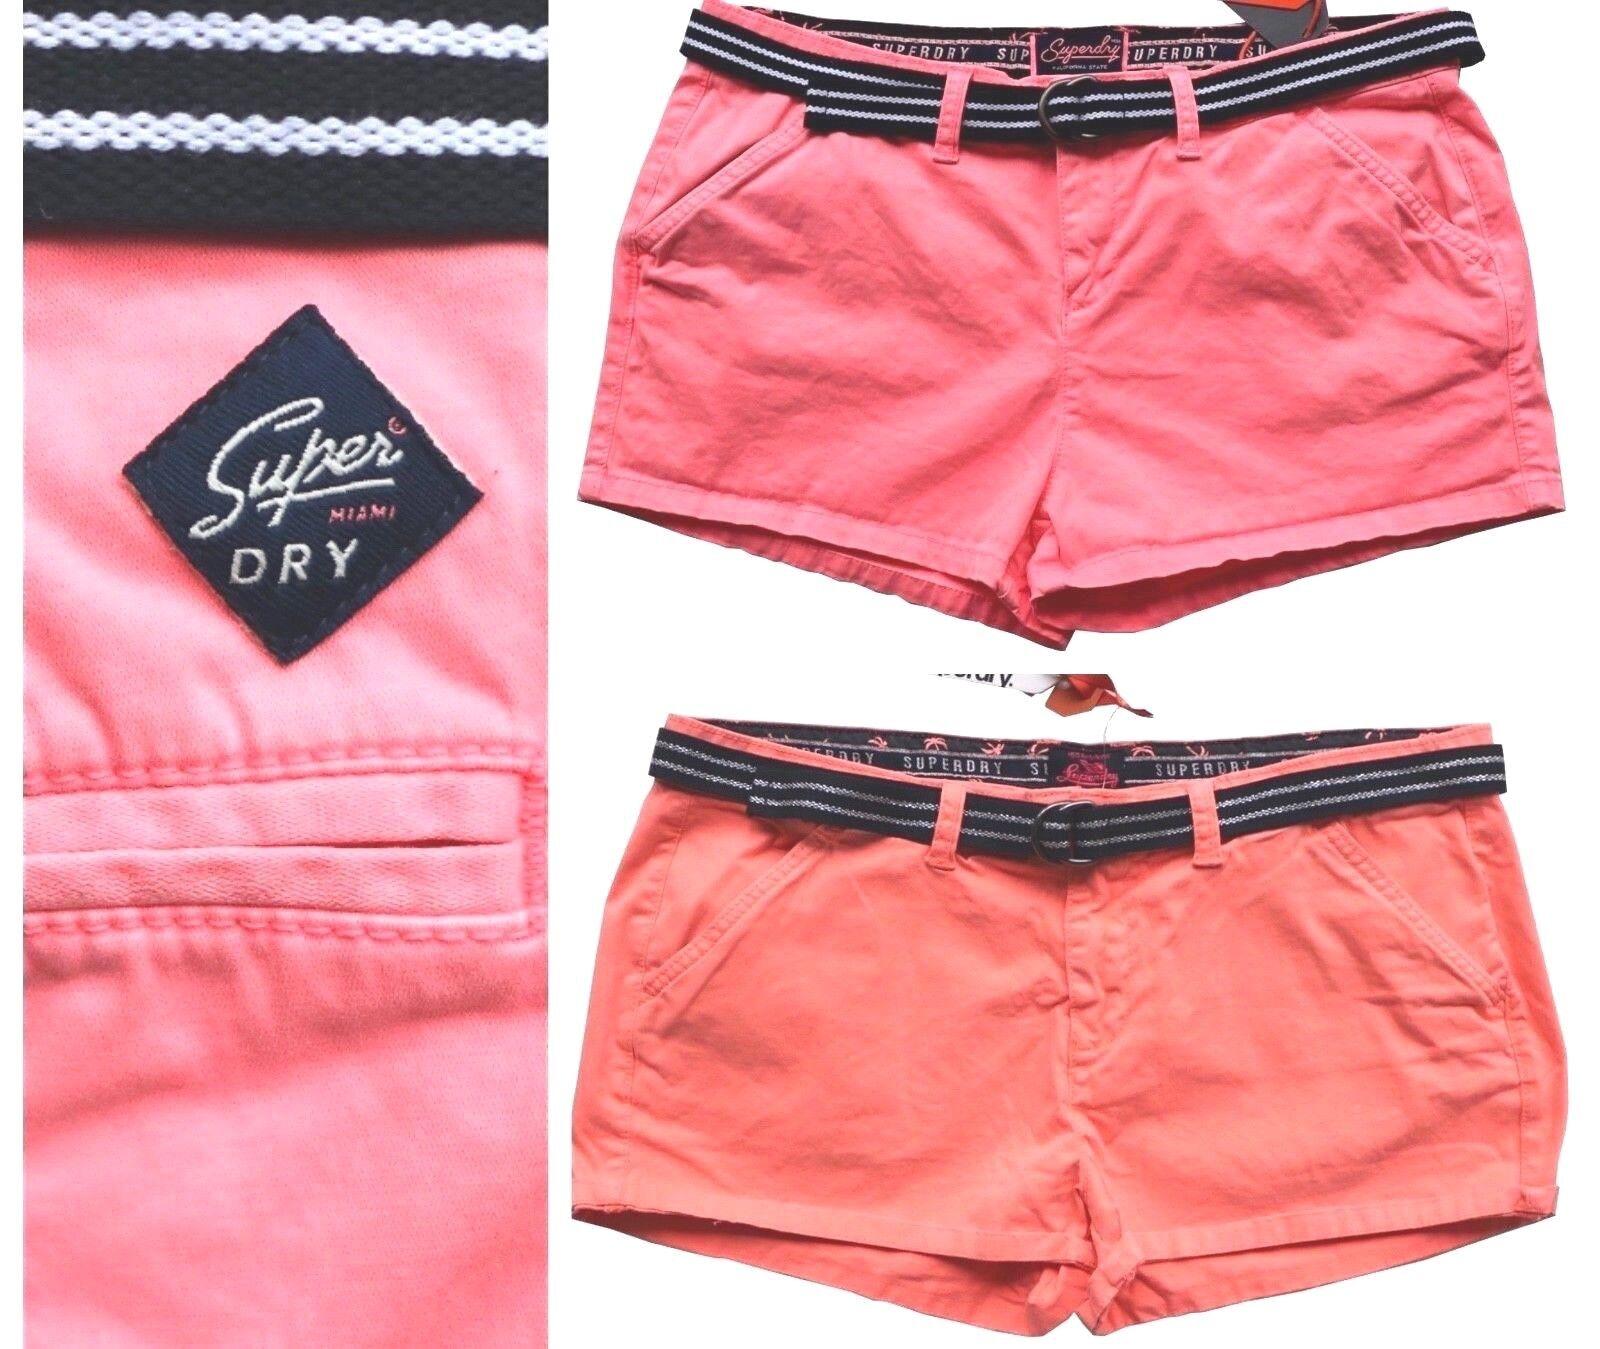 Superdry Shorts Dames International Vacances Chaud pink Néon, orange Fluo M, L,